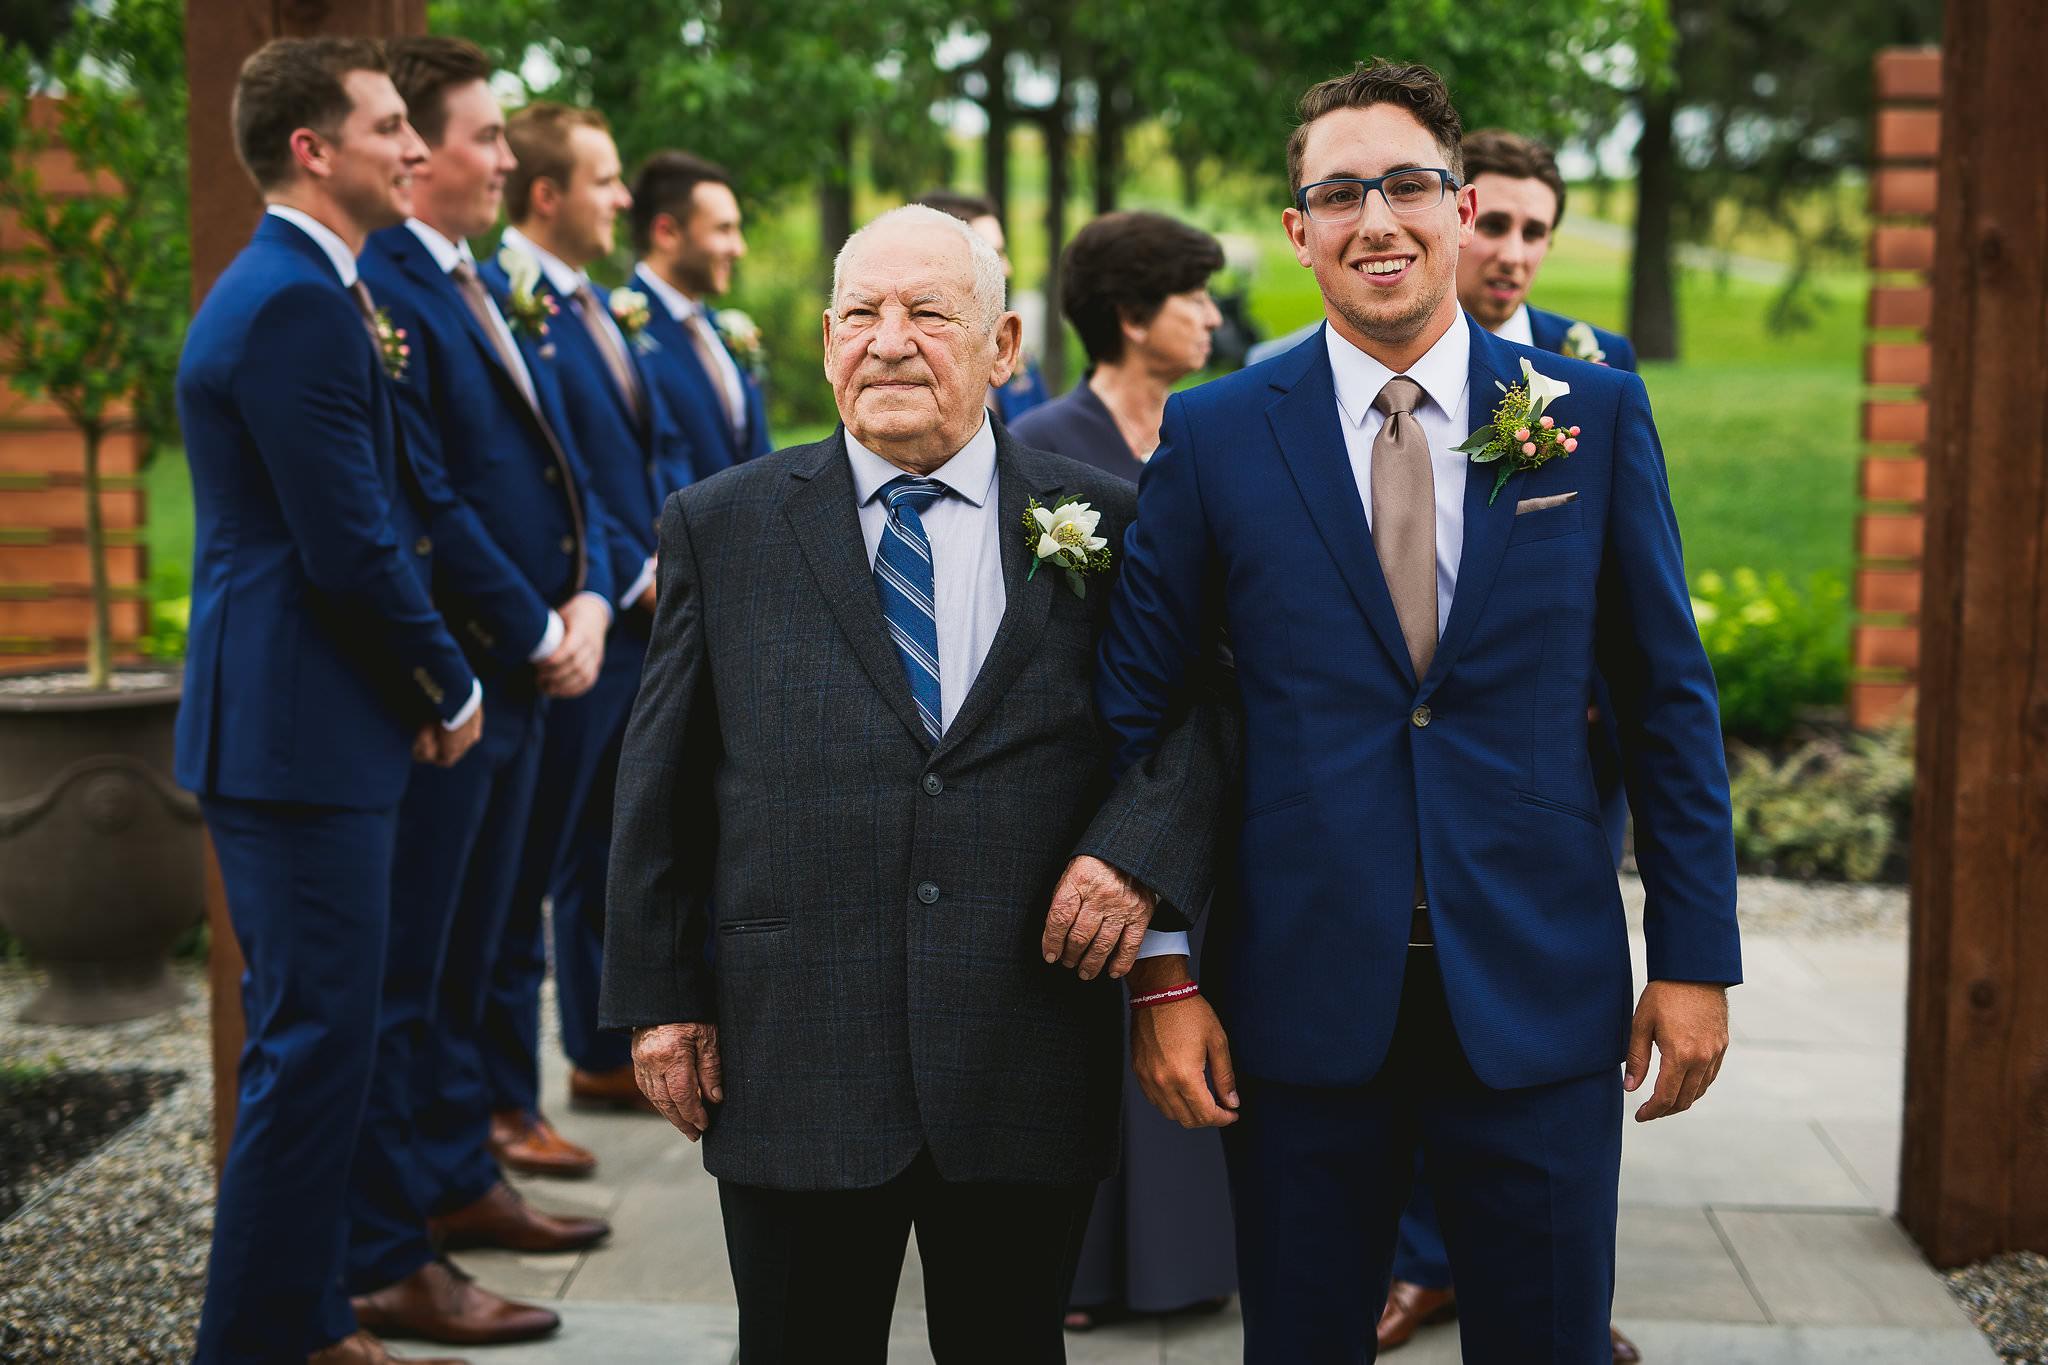 groomsman and grandpa walking down the aisle